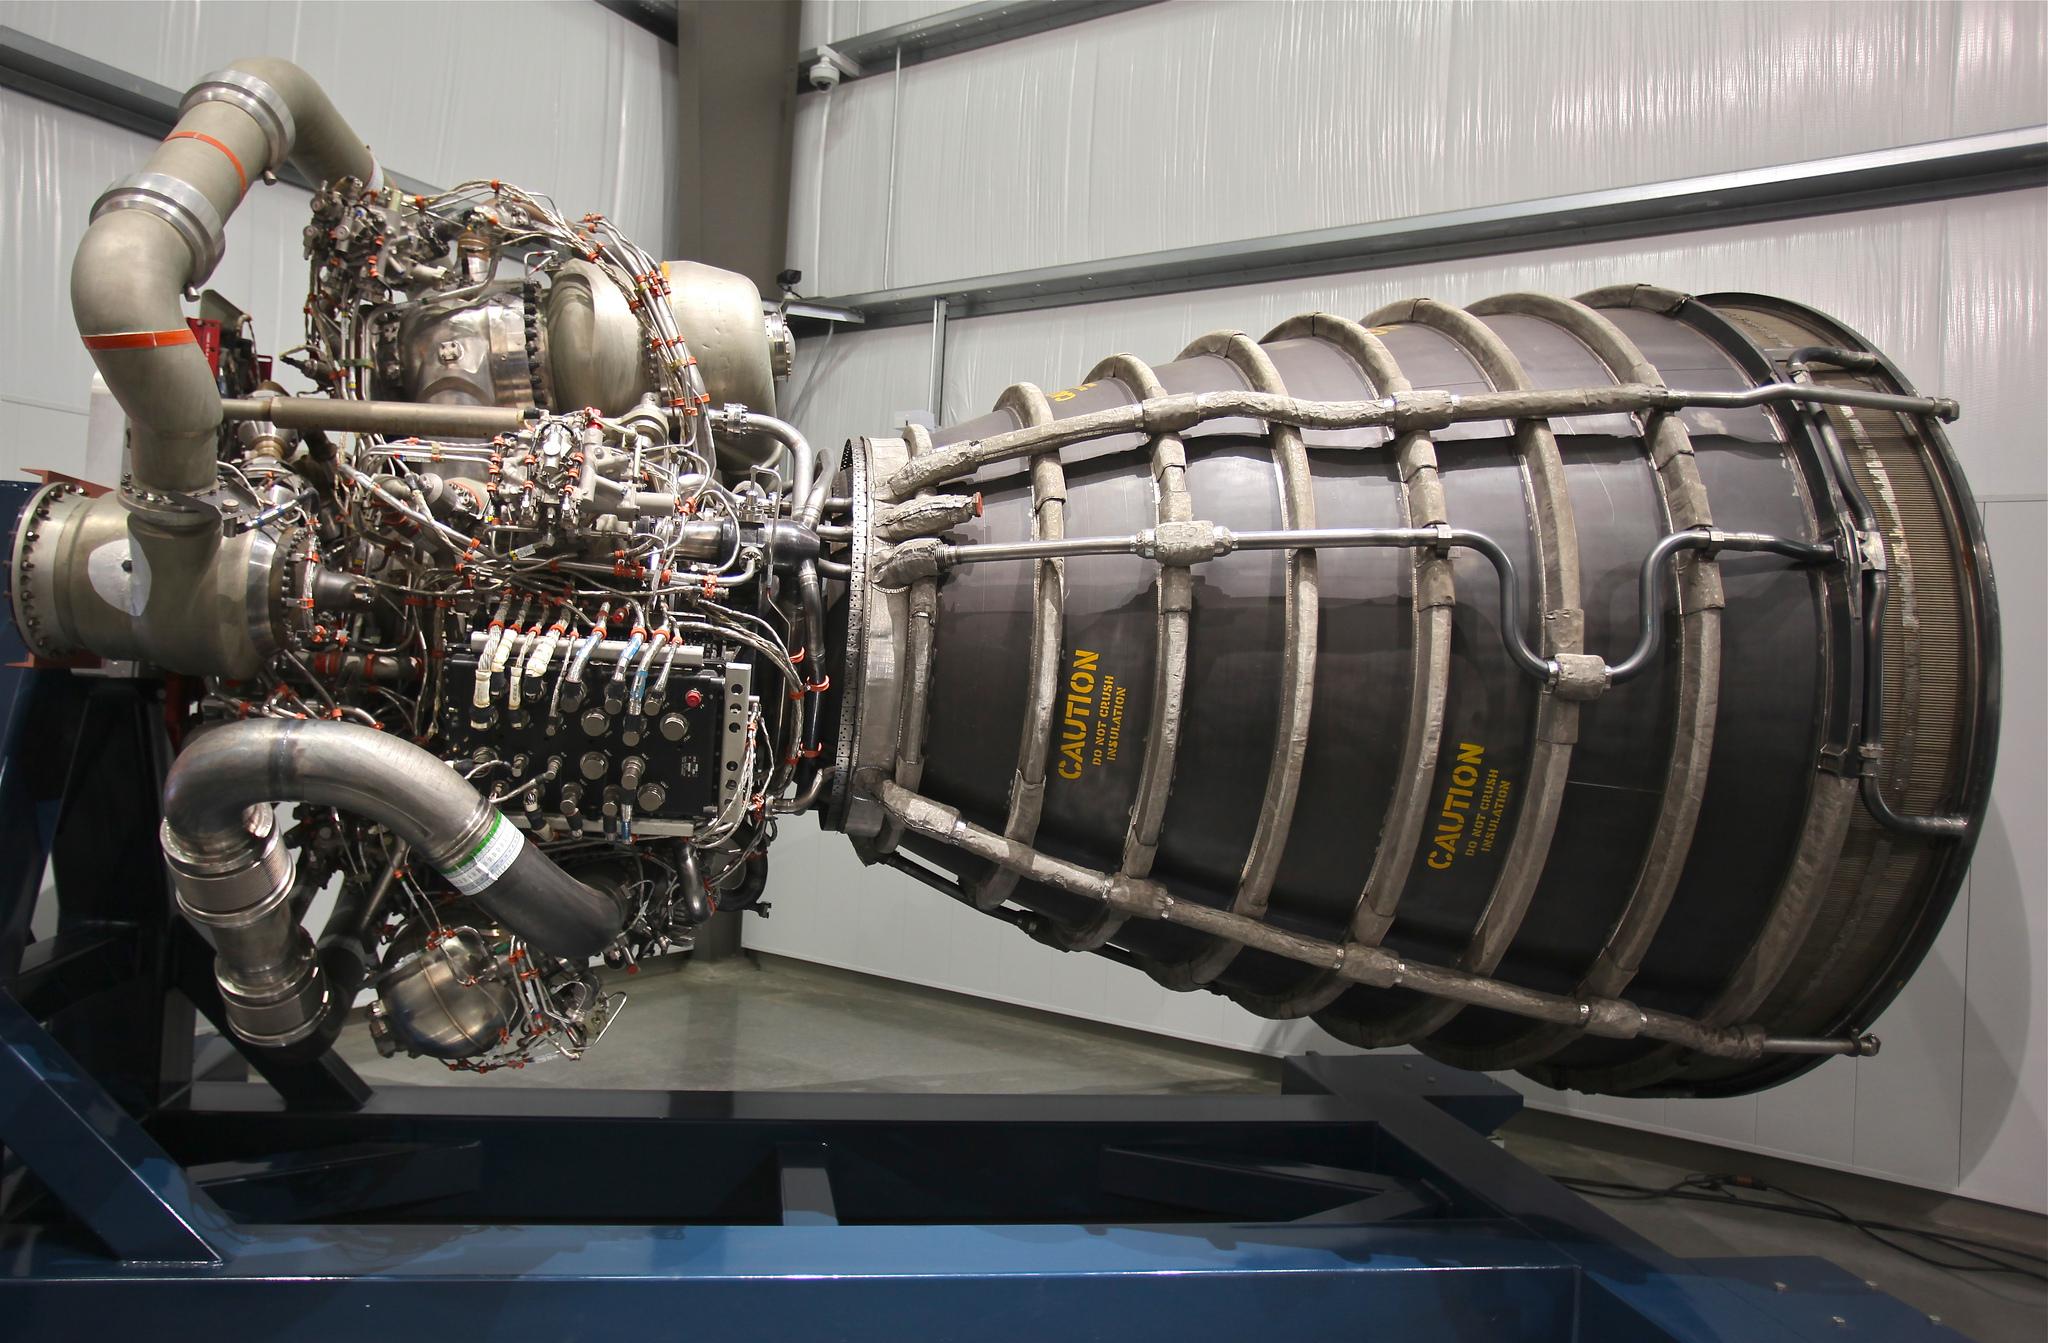 Space Shuttle Main Engine SSME